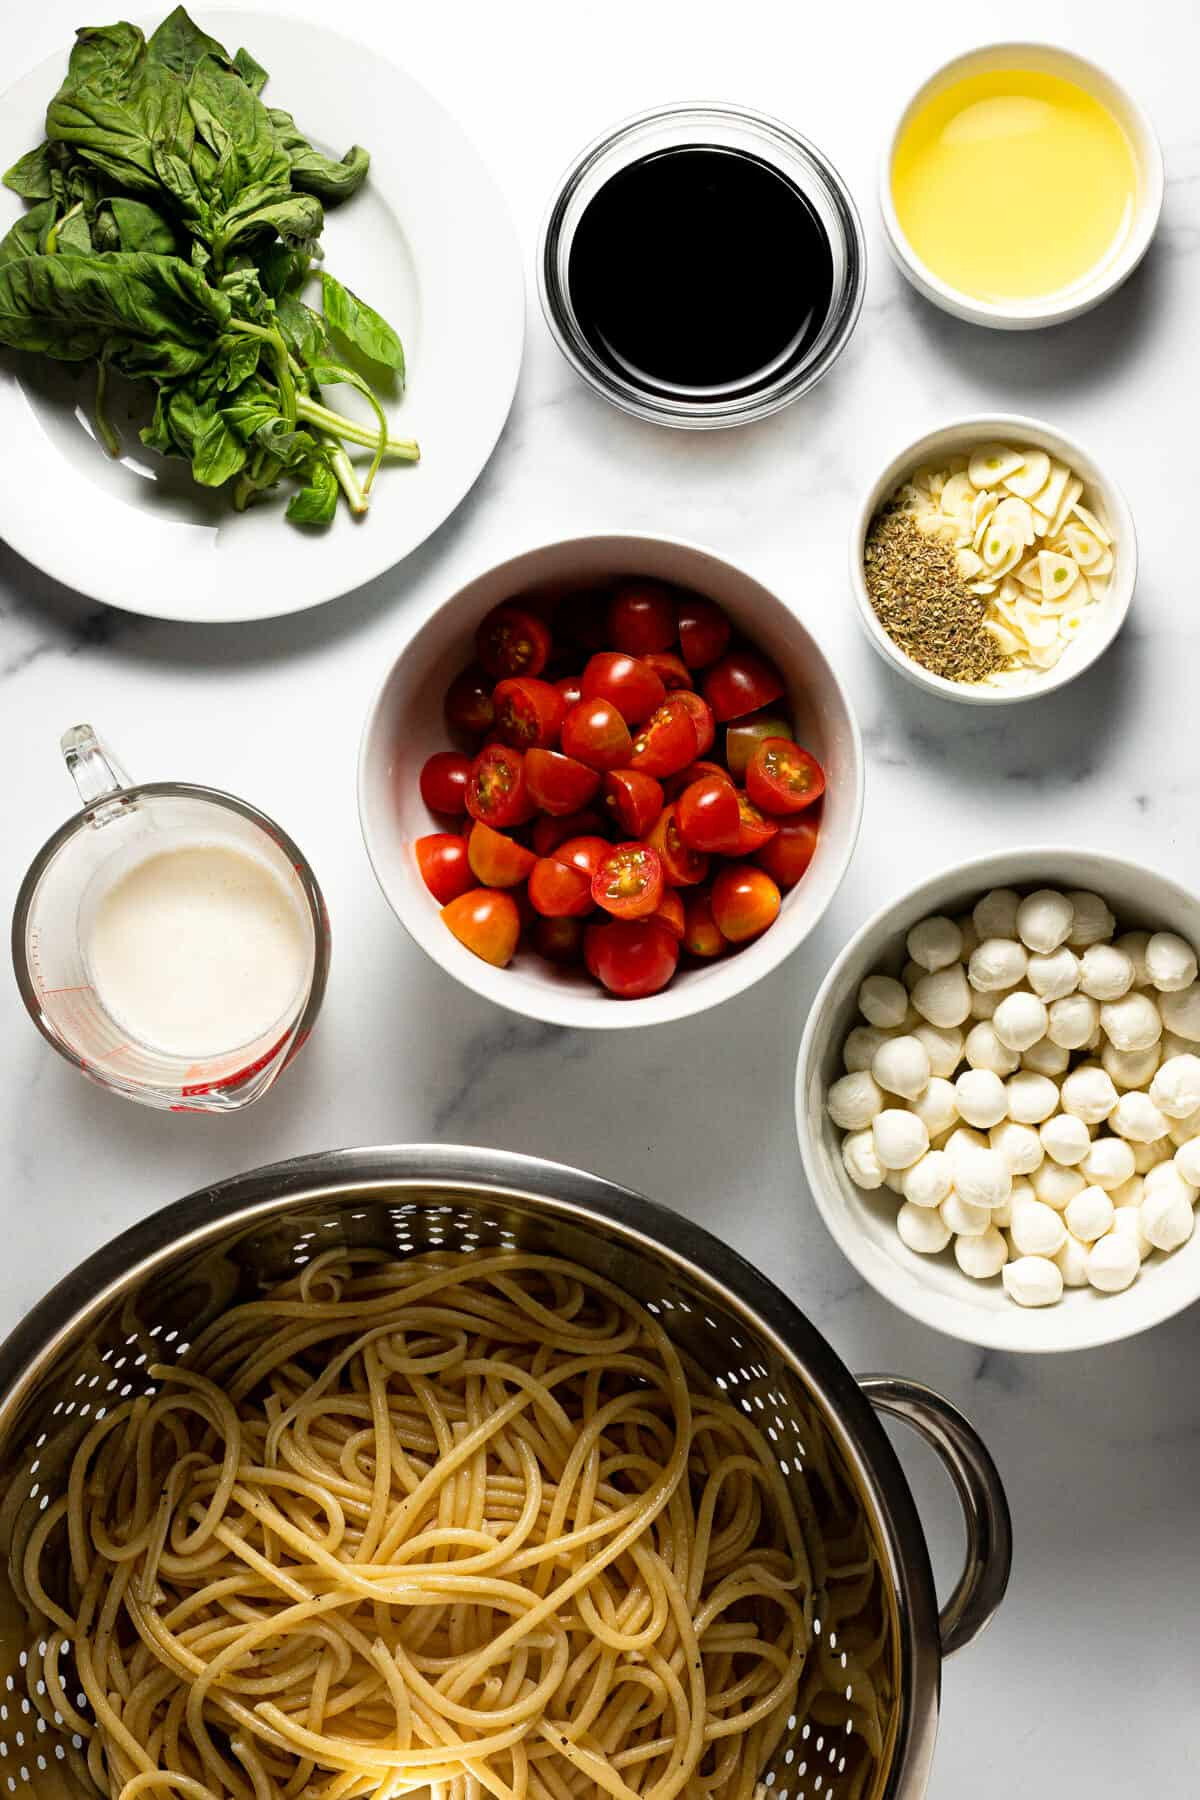 White marble countertop with ingredients to make bruschetta pasta